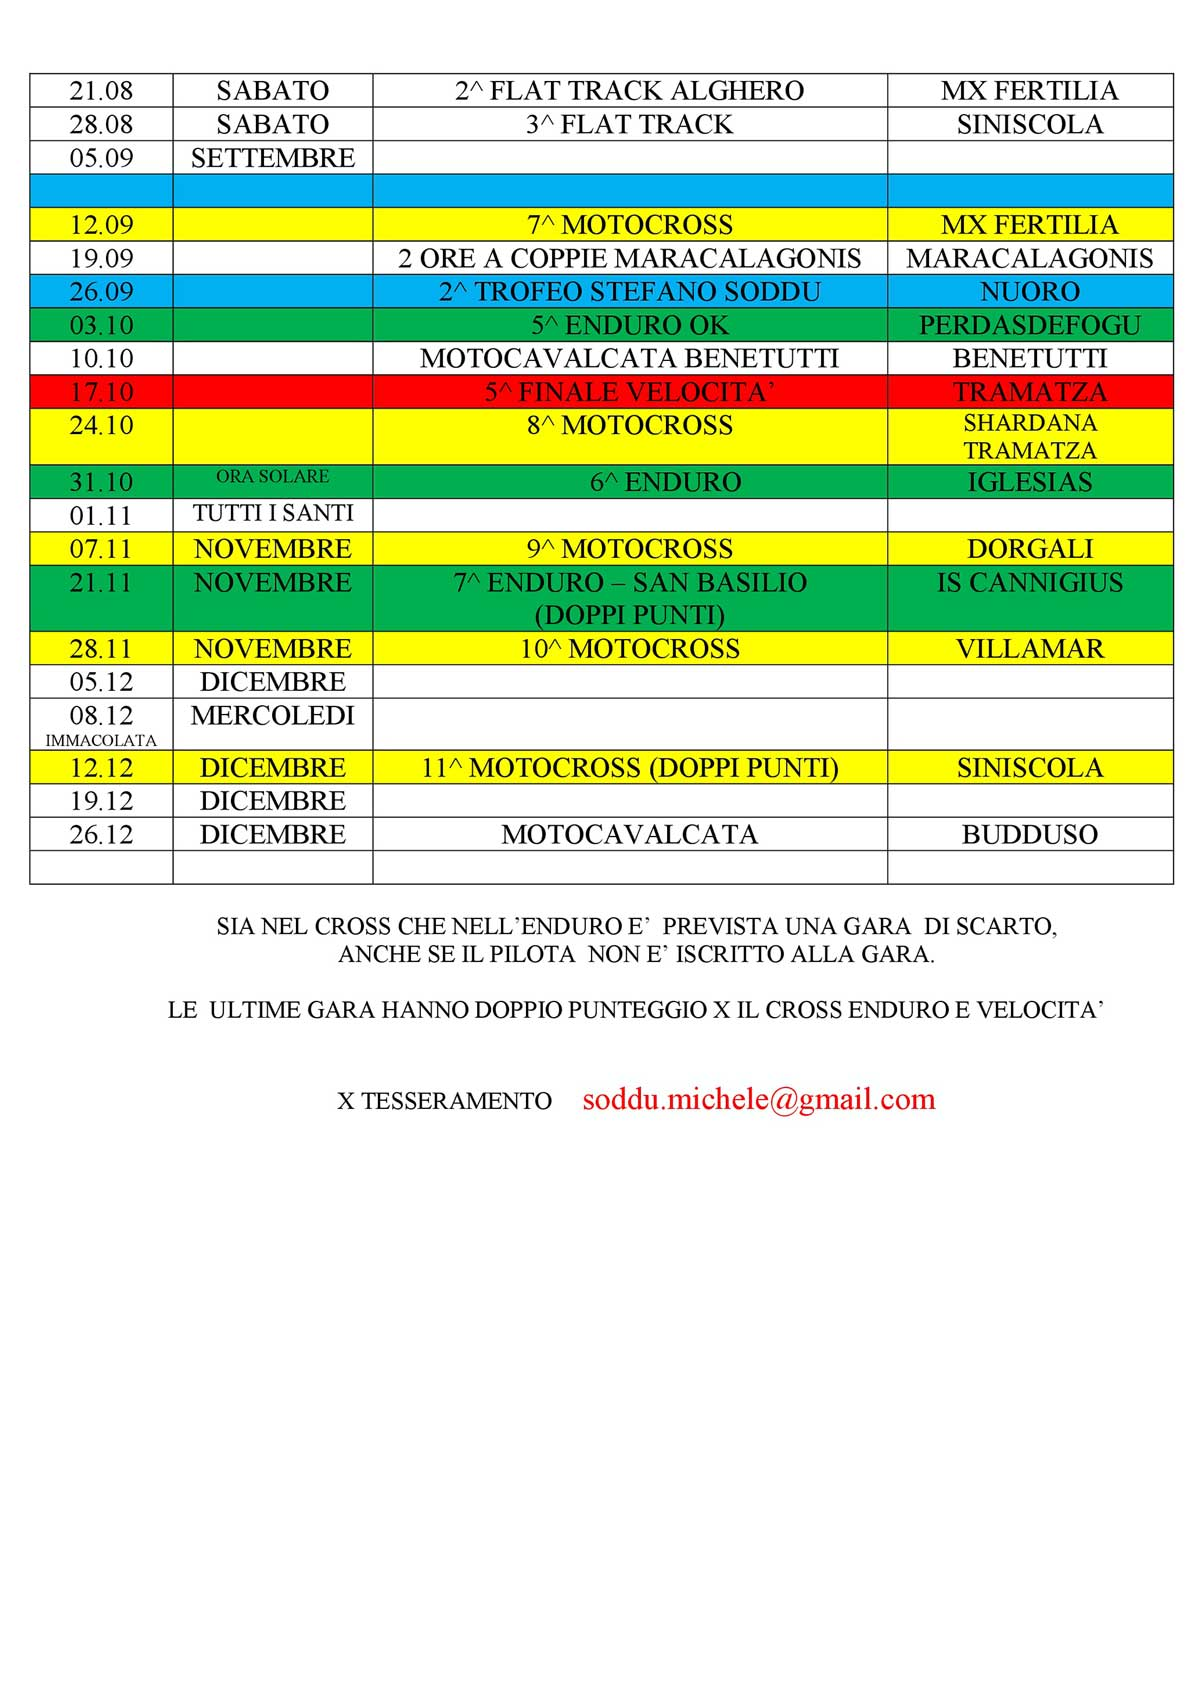 Calendario eventi MSP Sardegna 2021 pag 2